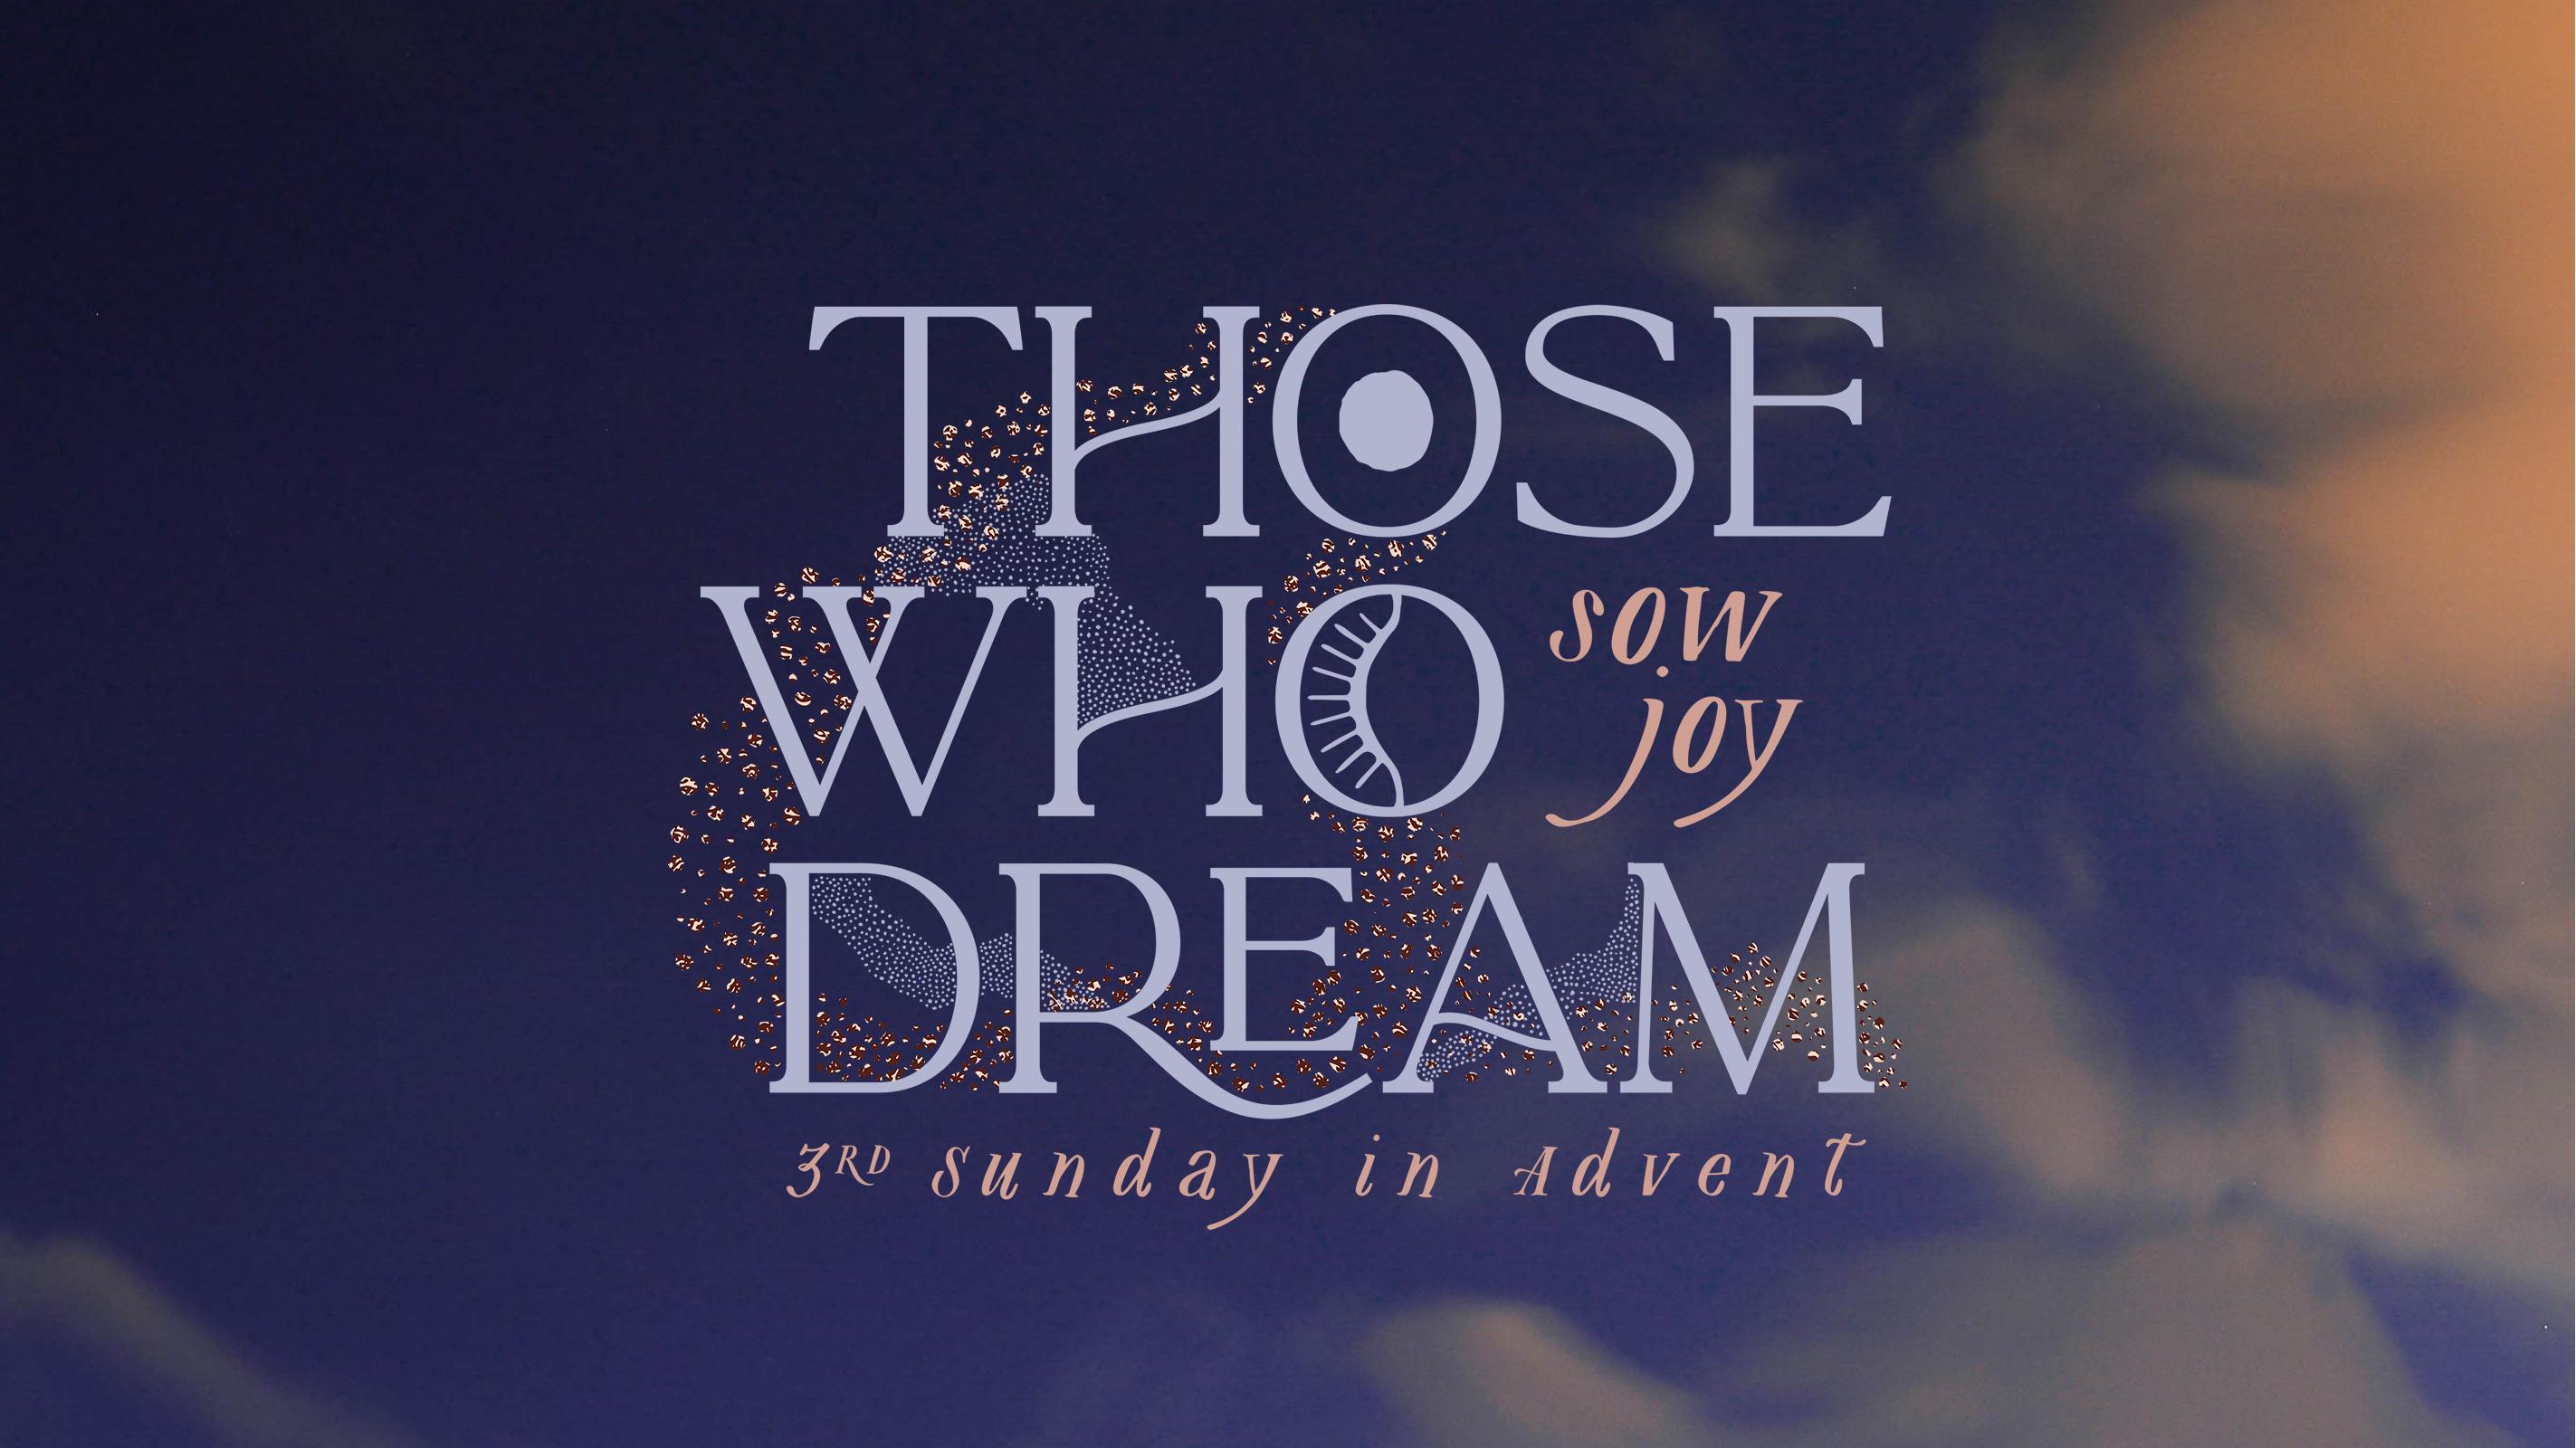 Those Who Dream Sow Joy